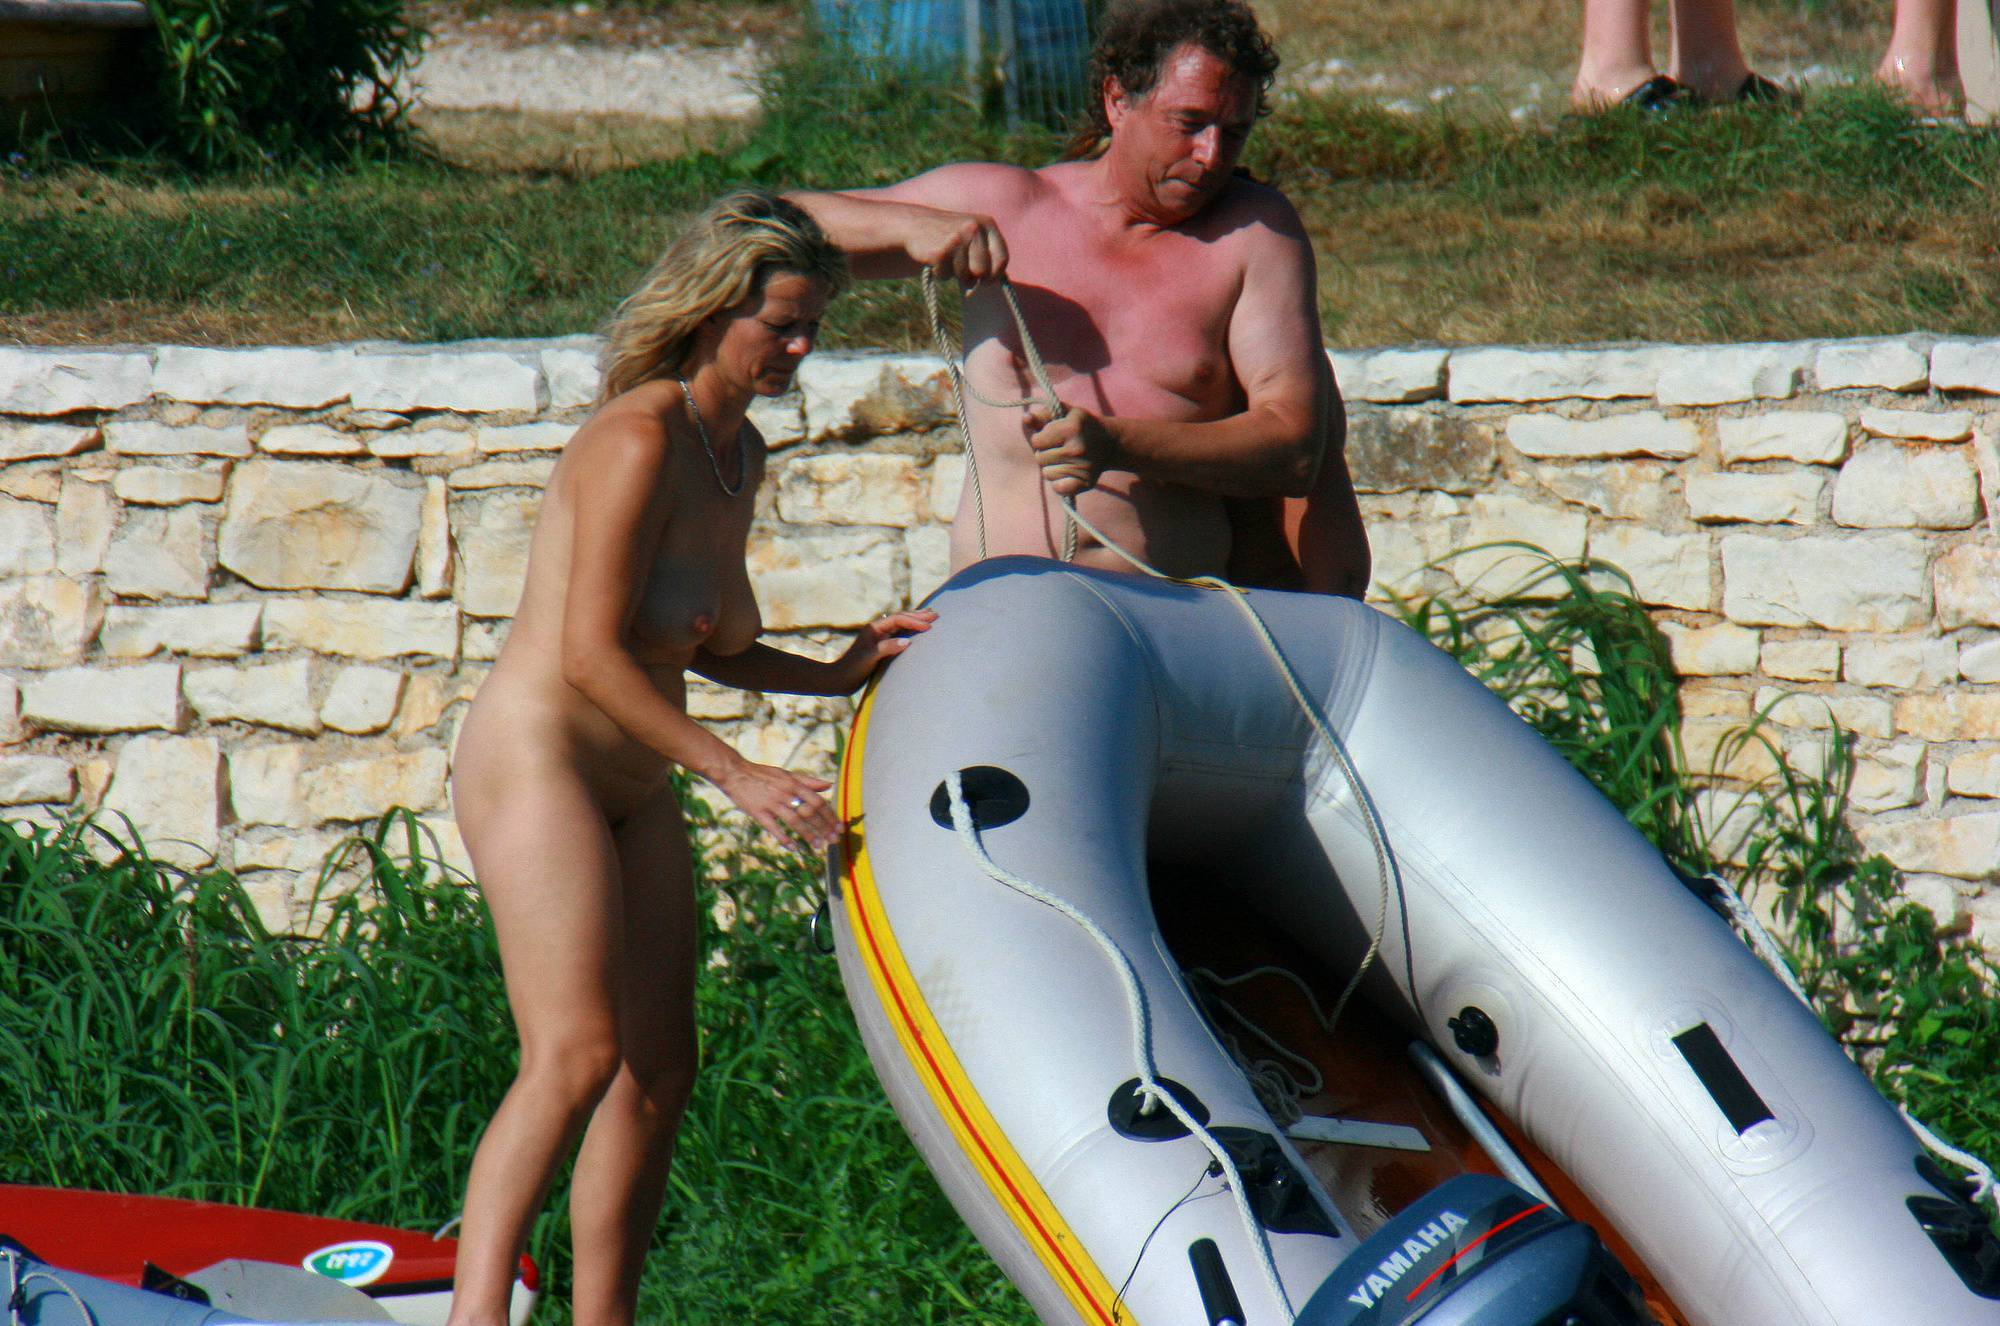 Purenudism-Uka FKK Boating Day Plans - 2